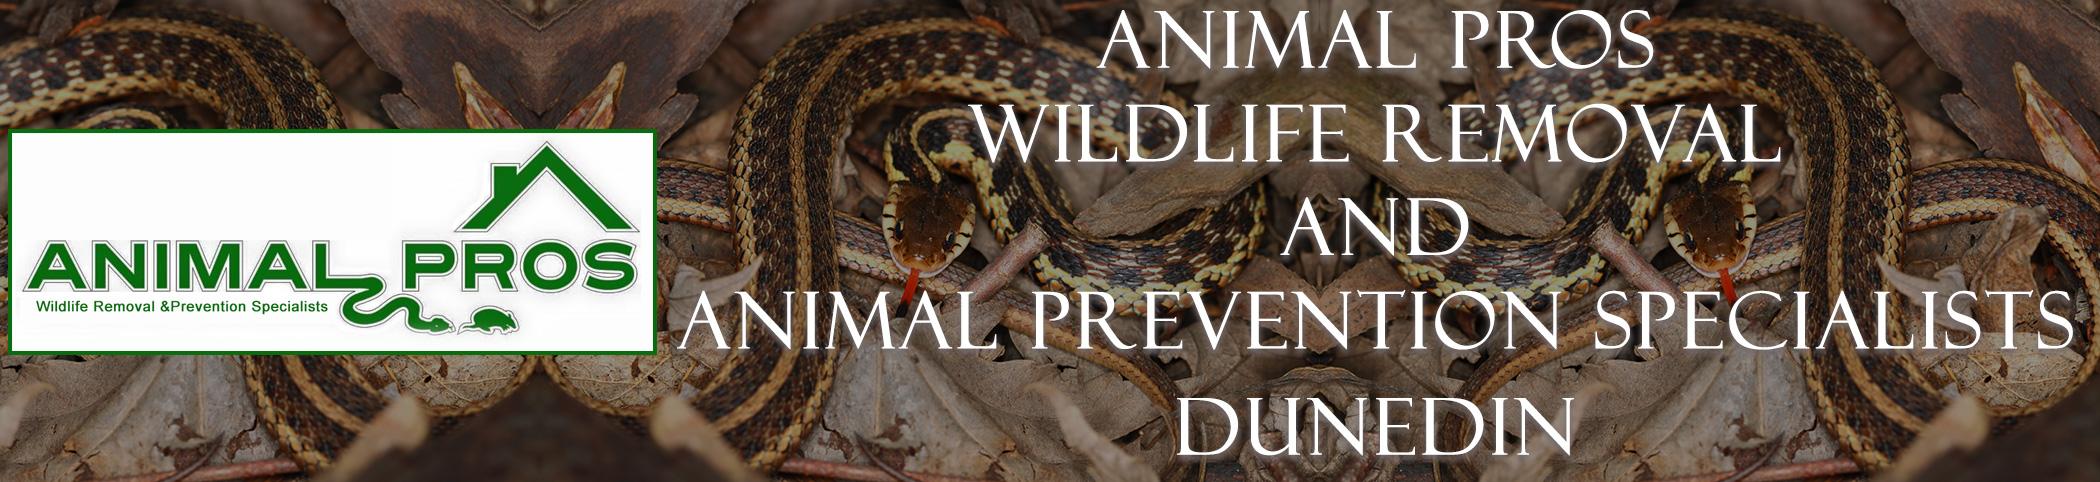 Animal Pros Dunedin Florida Bat Removal And Wildlife Removal Header Image